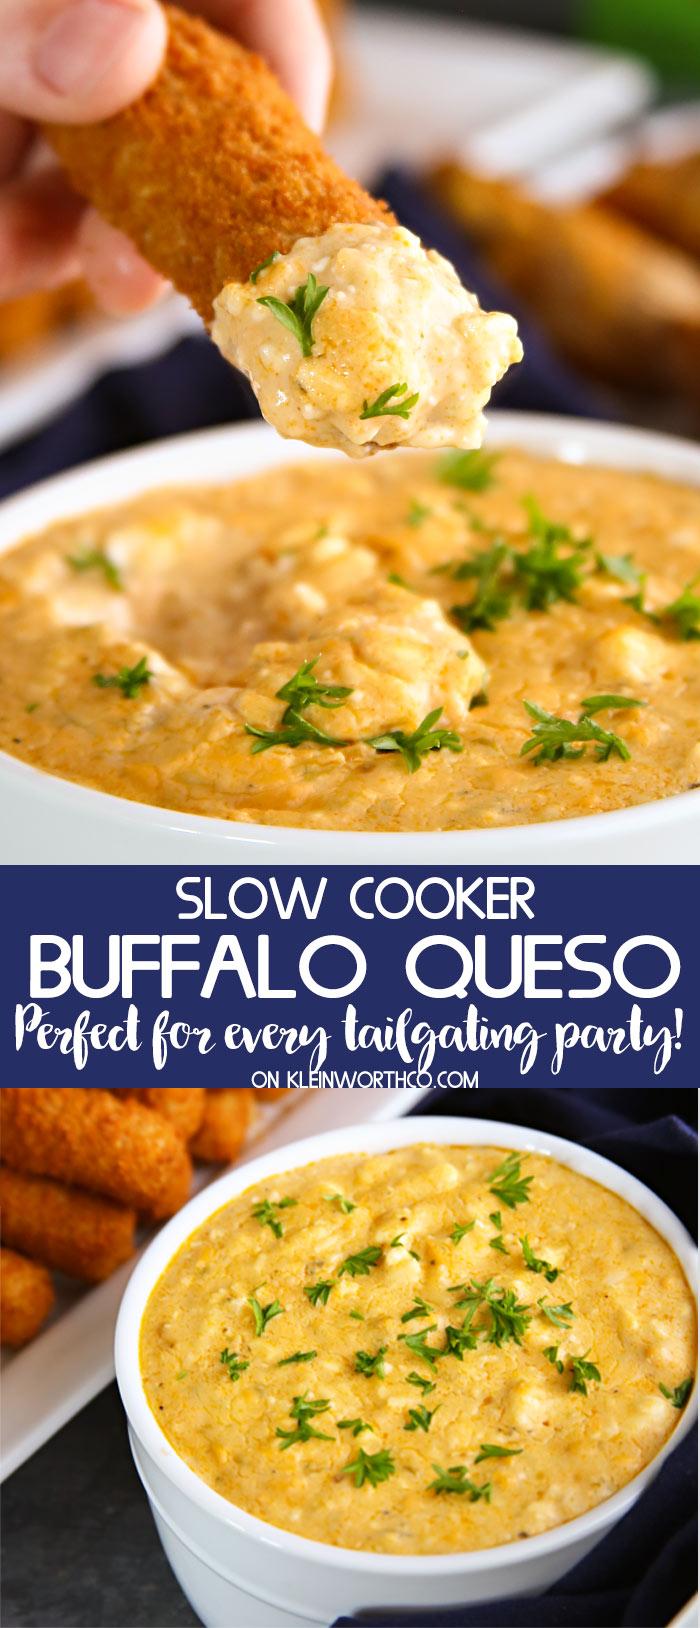 Slow Cooker Buffalo Queso Dip Recipe